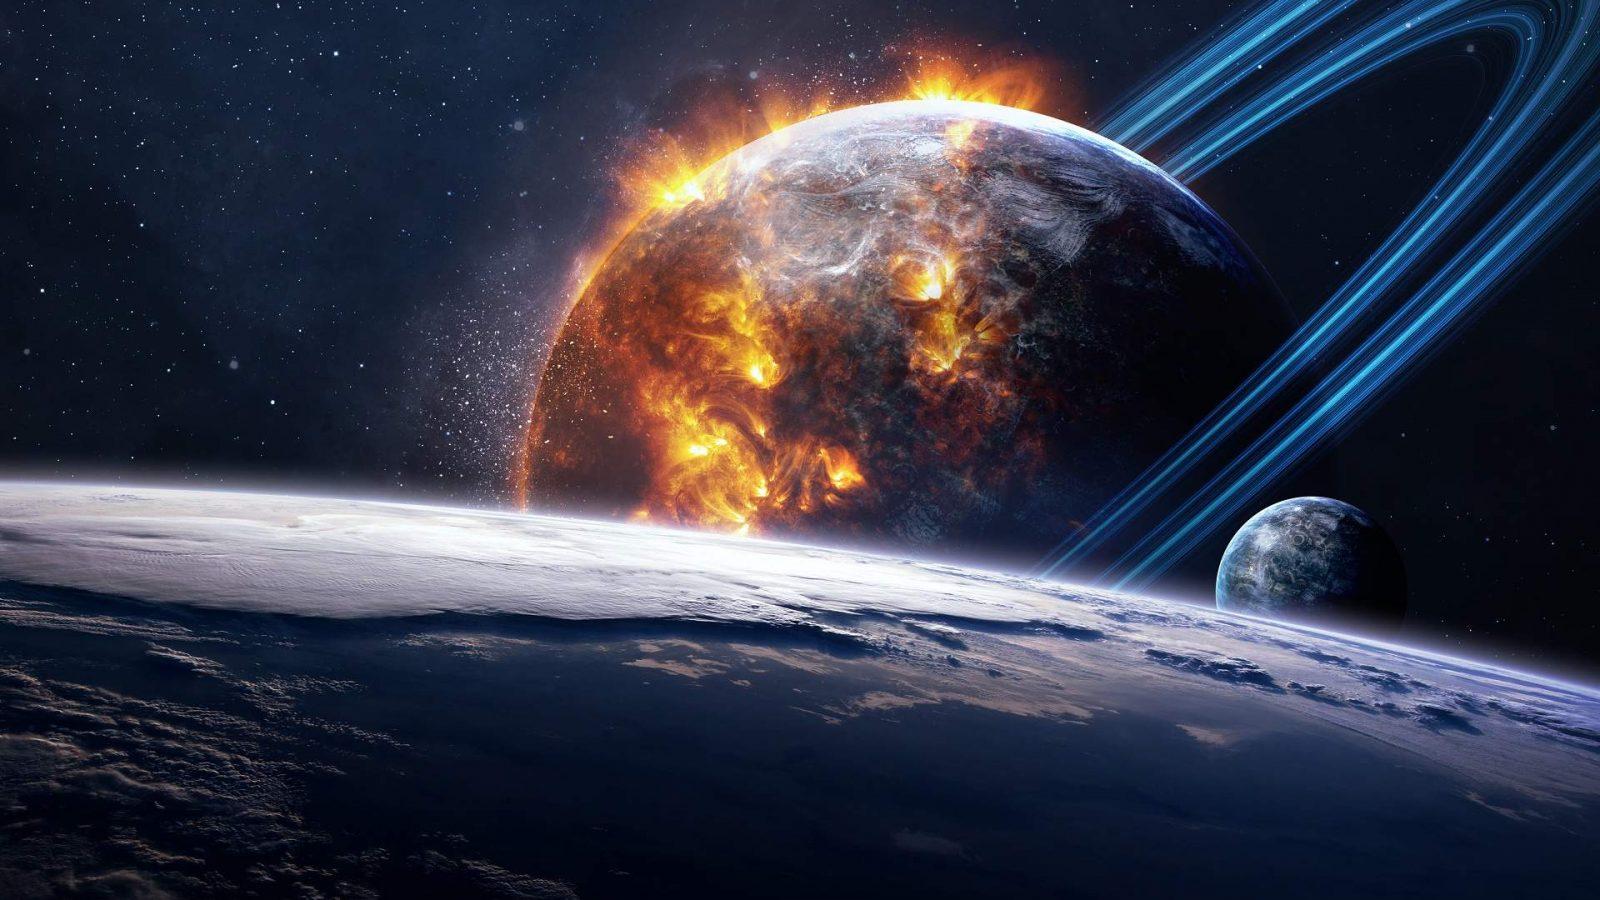 Planetary Ring HD wallpapers, Desktop wallpaper - most viewed